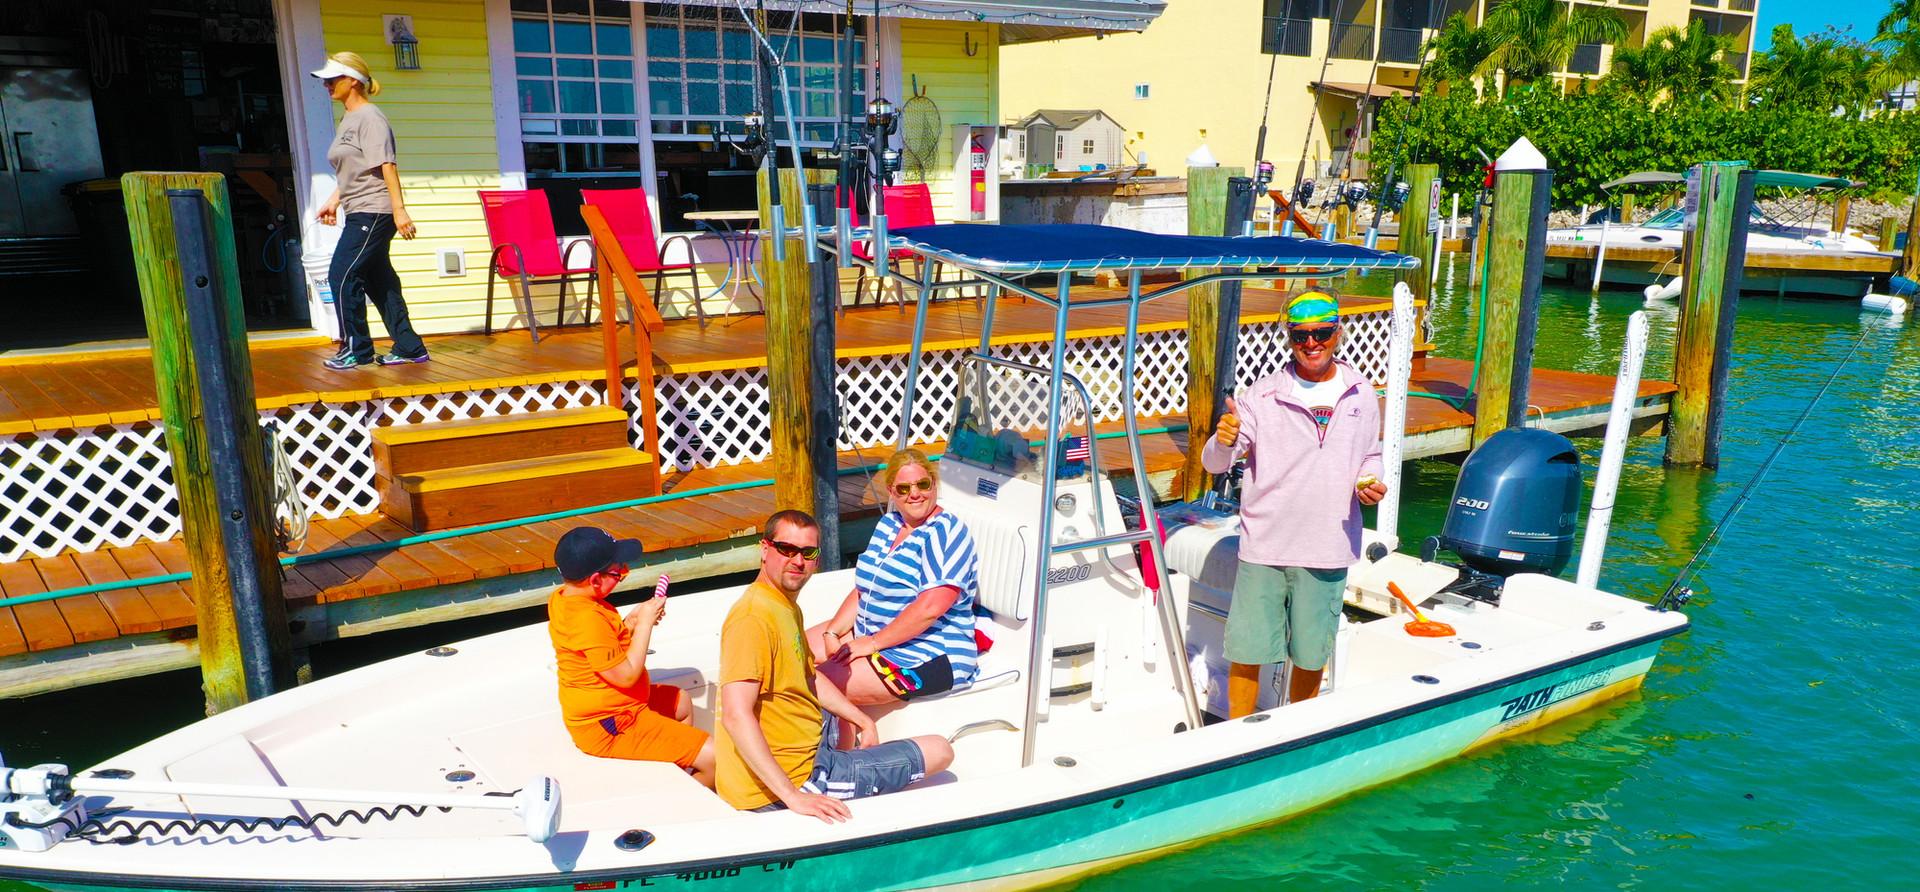 Pathfinder Boat fueling up at Pelican Pier Marina